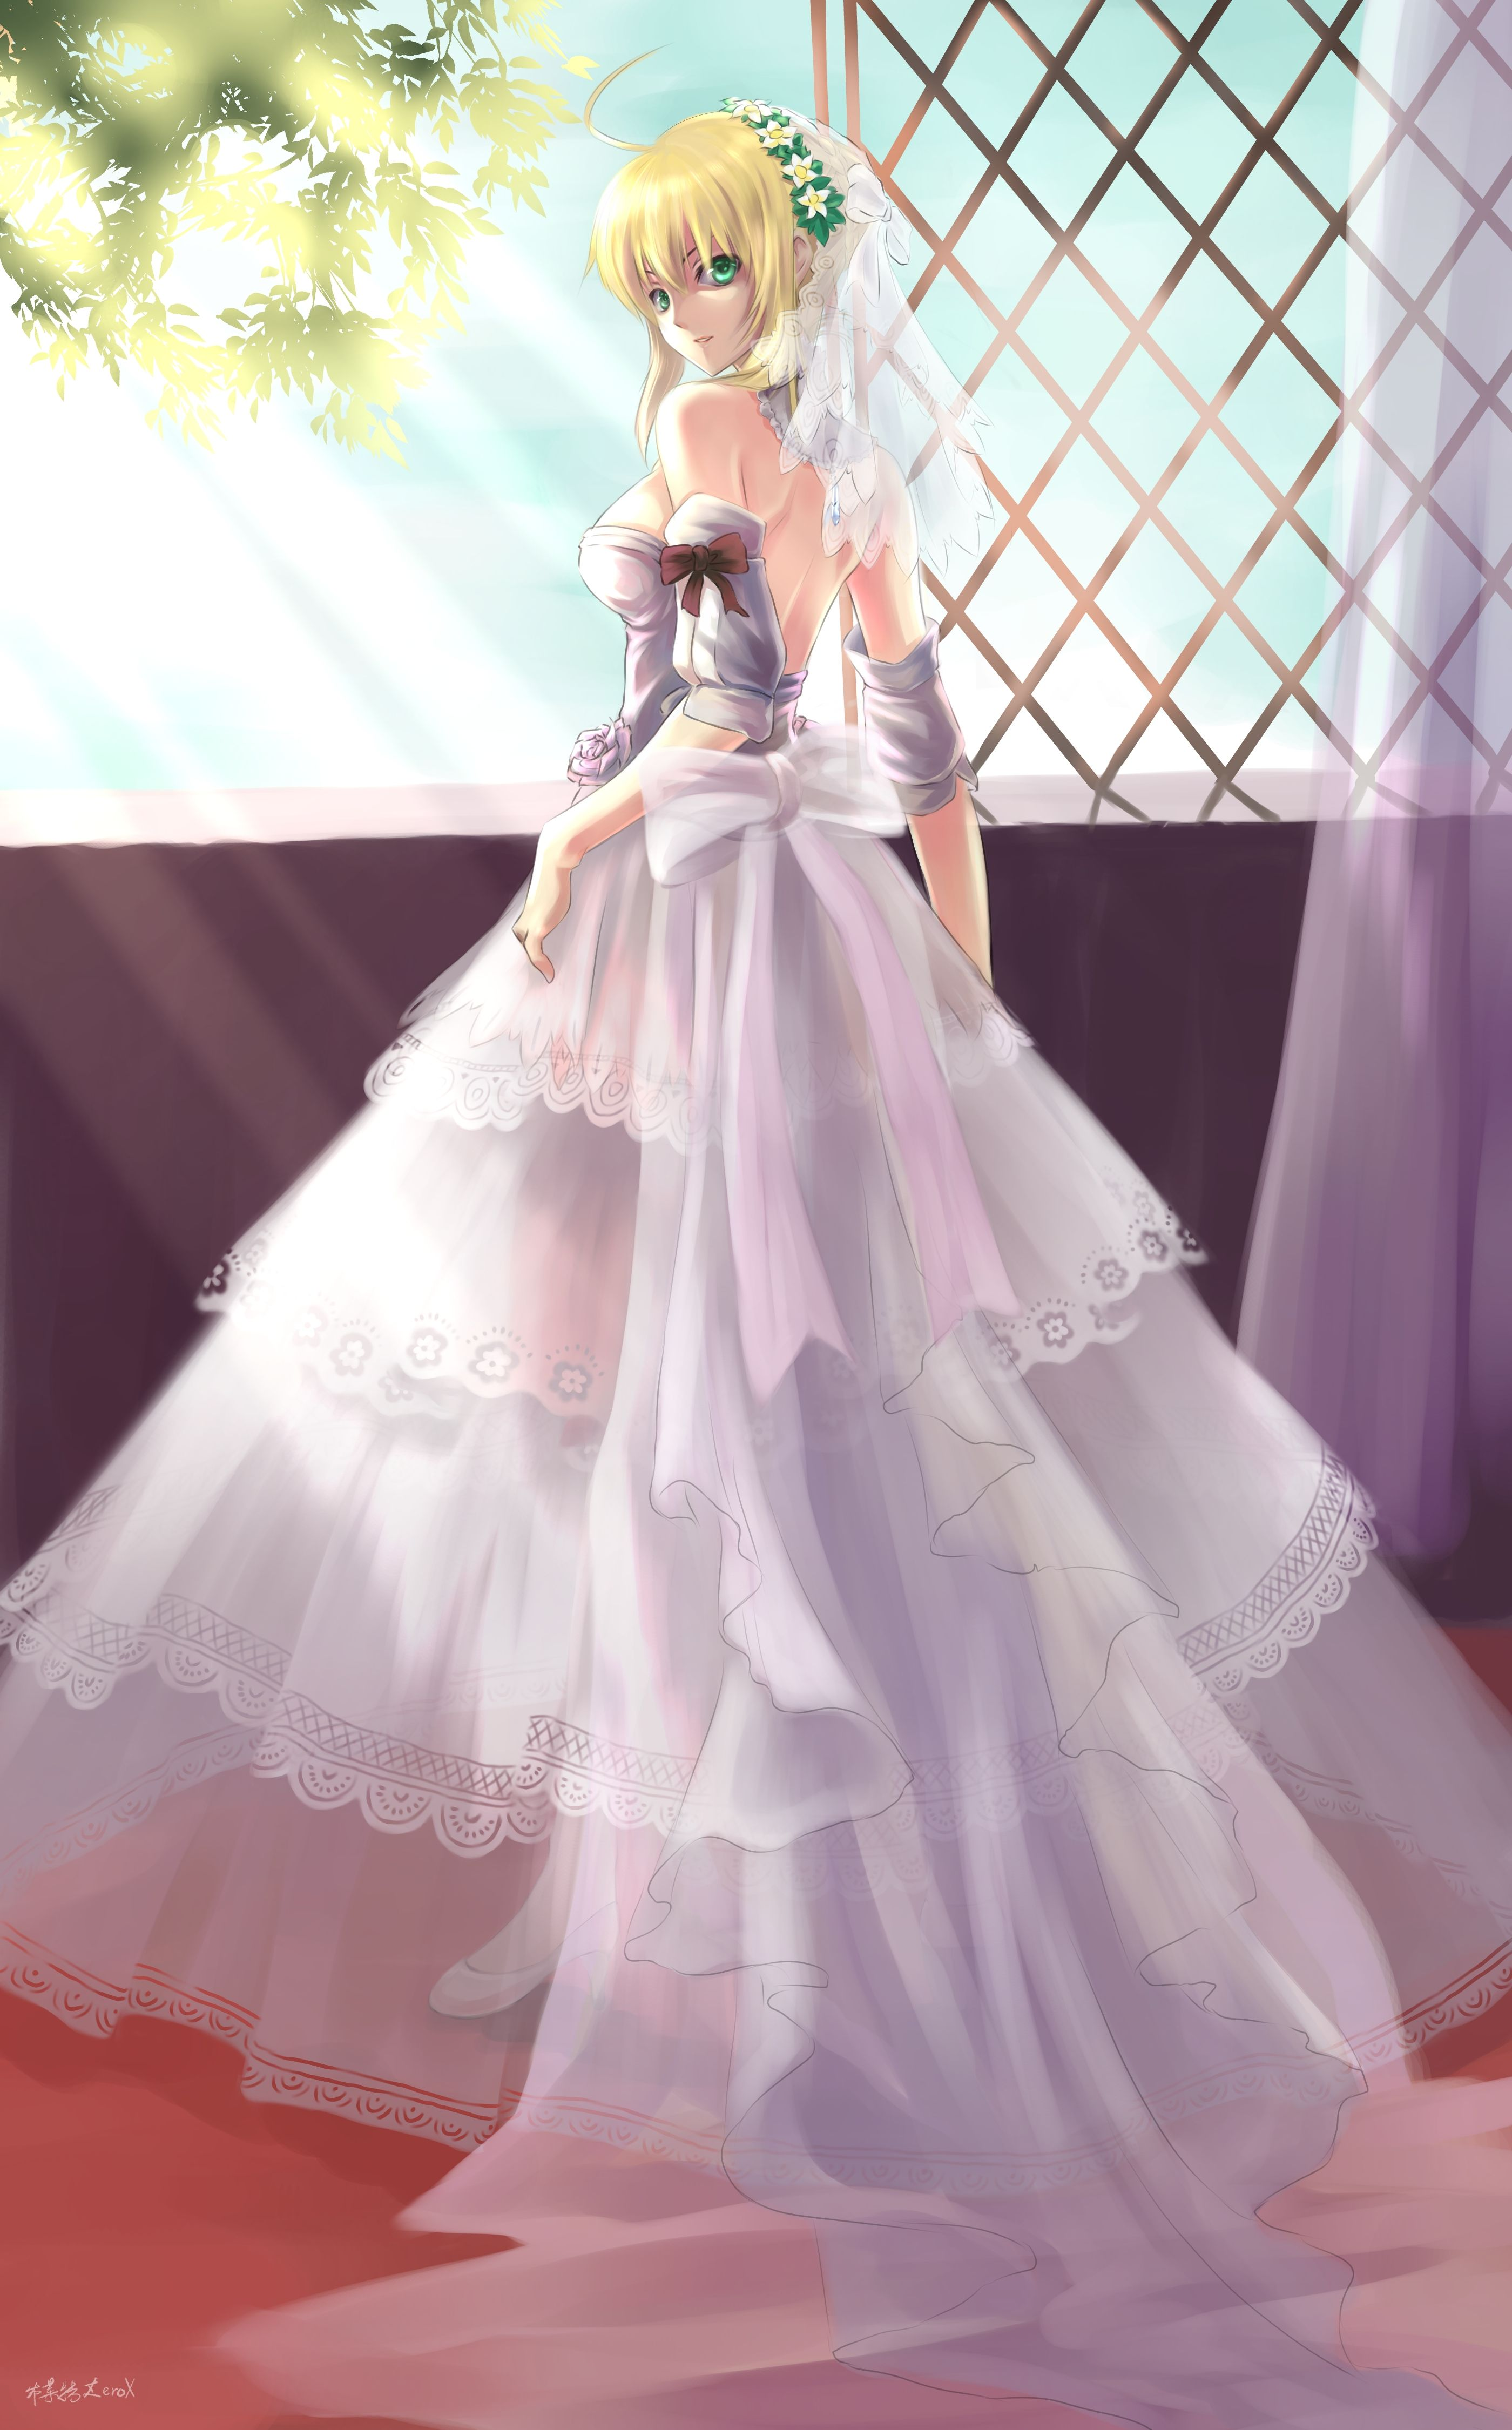 Saber Bride by Bzerox | Anime Wedding Dress | Pinterest | Fate stay ...